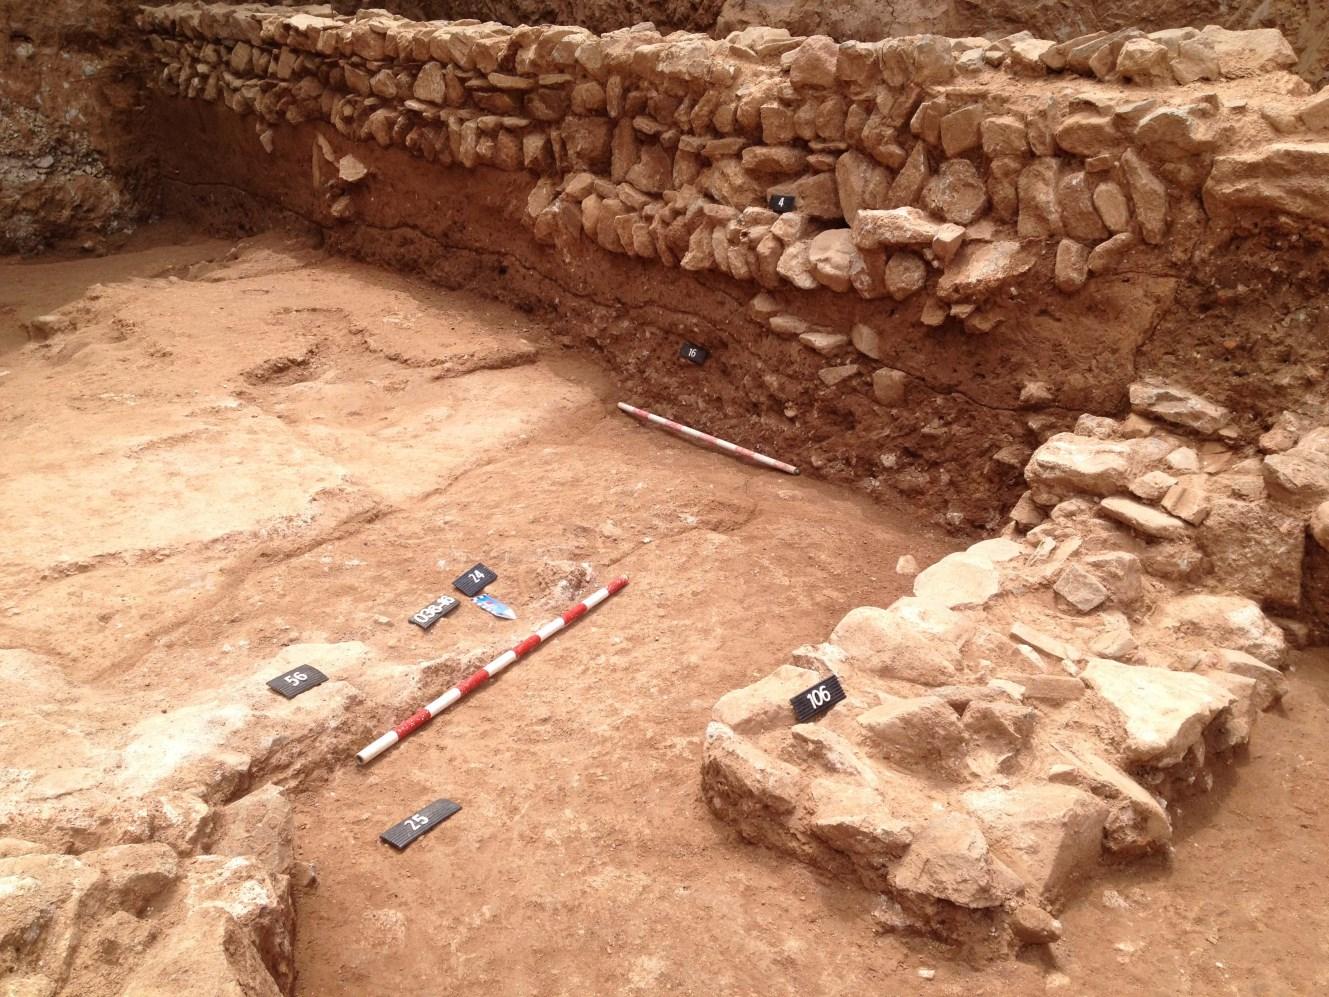 Mur baixmedieval (a dalt), i paviment romà d'opus signinum (a sota) Foto: Joan Piera